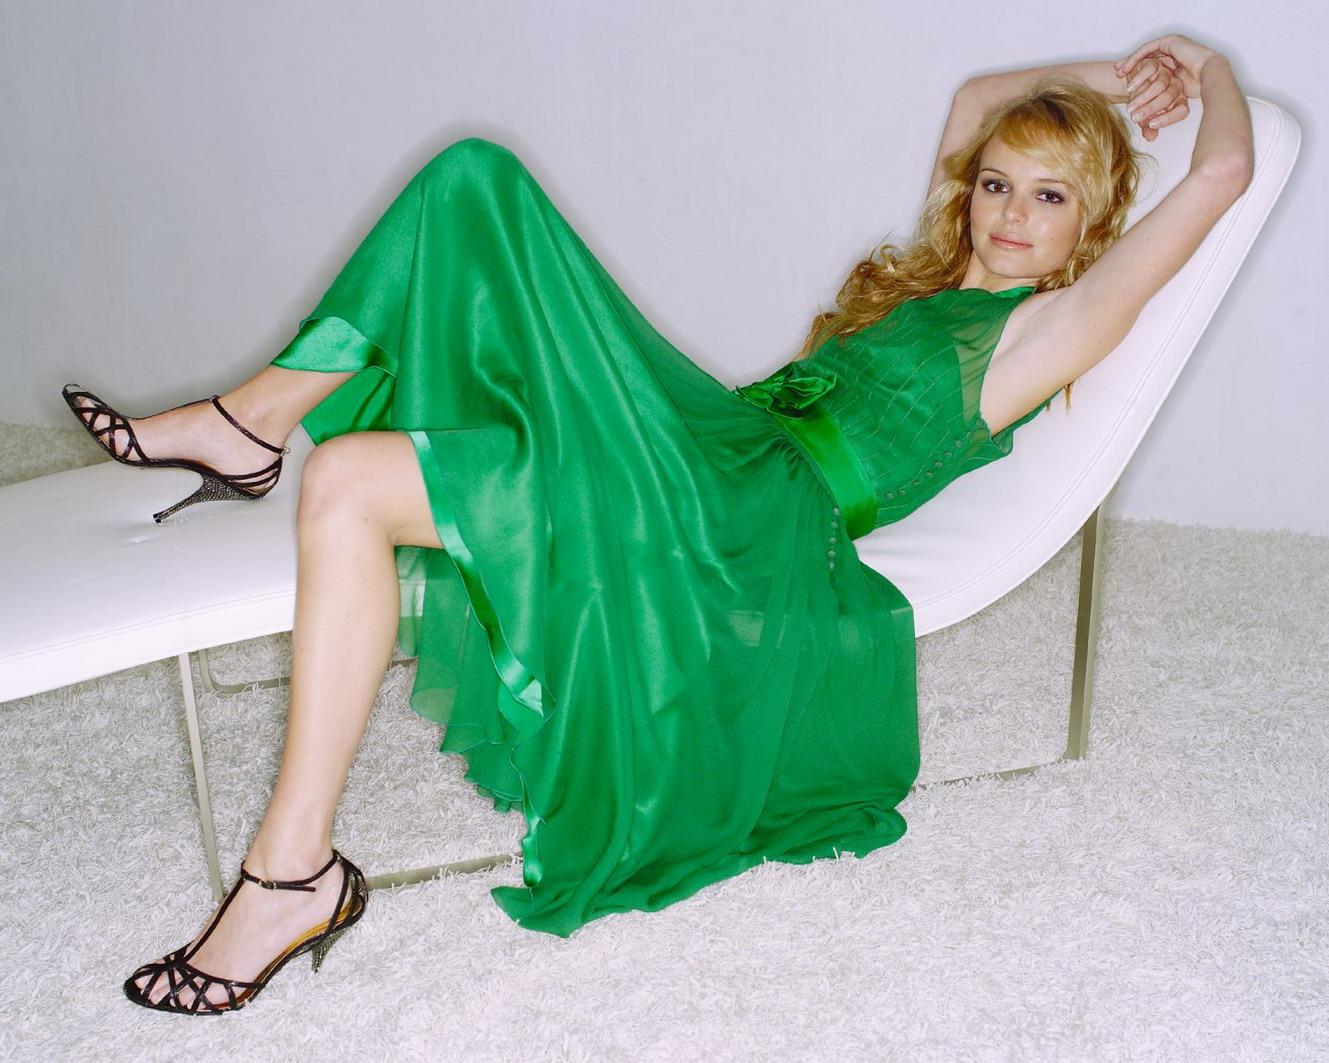 http://1.bp.blogspot.com/_UaLWp72nij4/S-R_Gdat01I/AAAAAAAAKMo/wTMp4QX3Yfs/s1600/kate-bosworth-feet-3.jpg